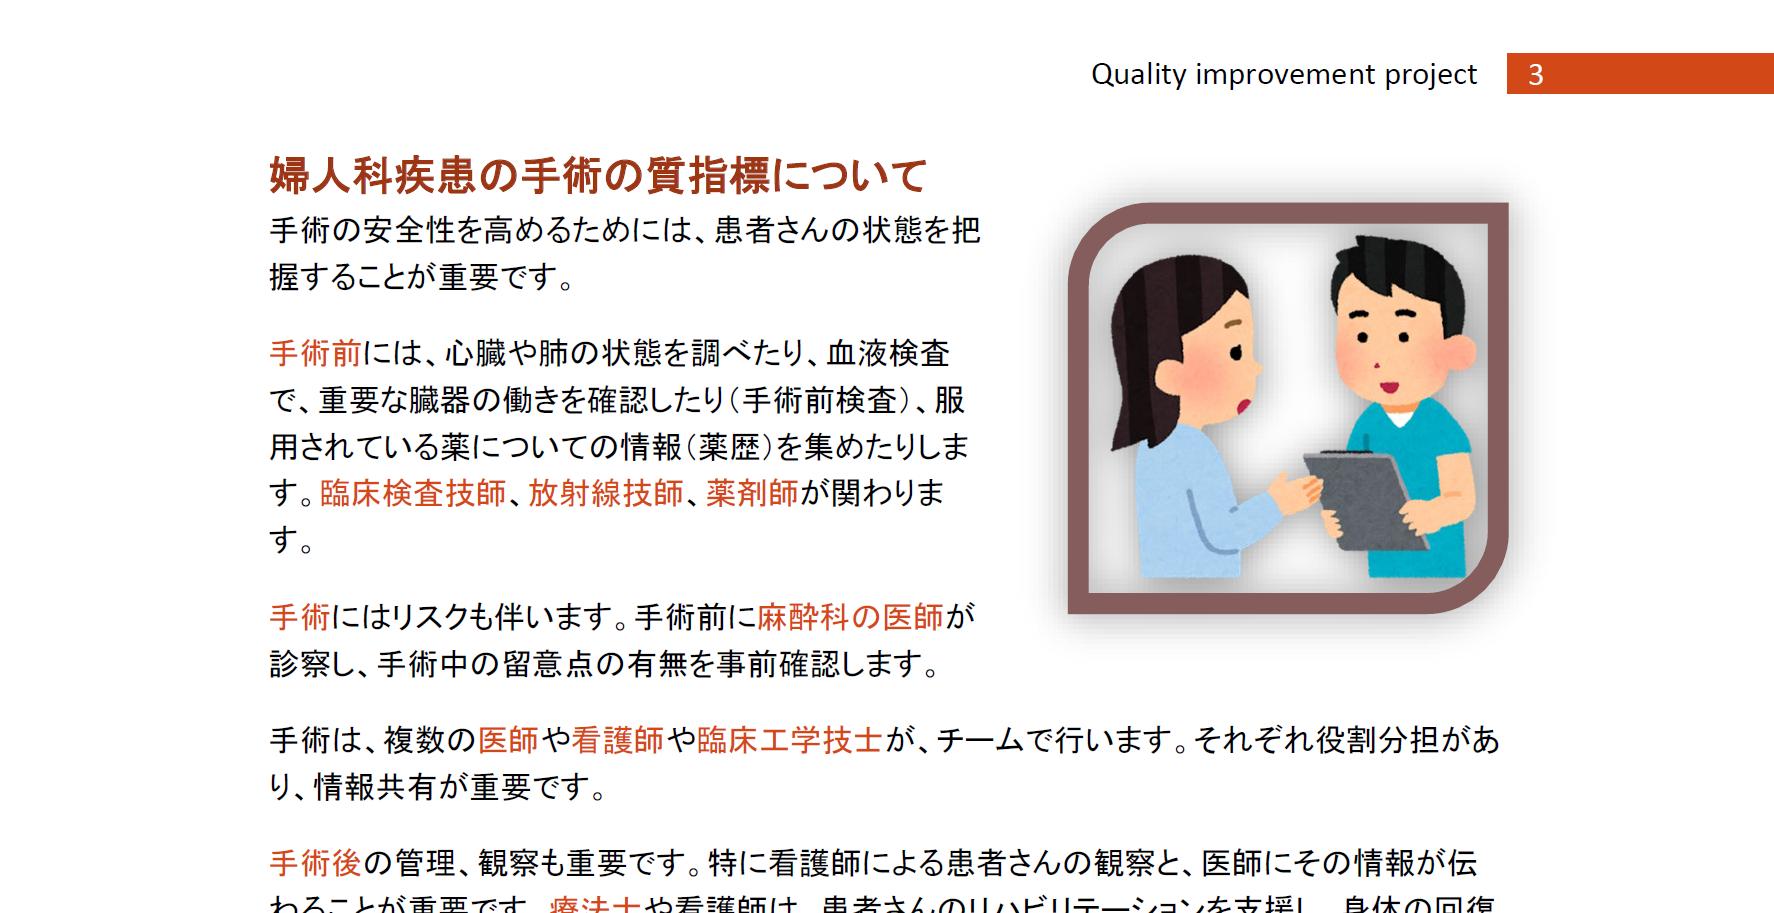 医療の質指標 婦人科